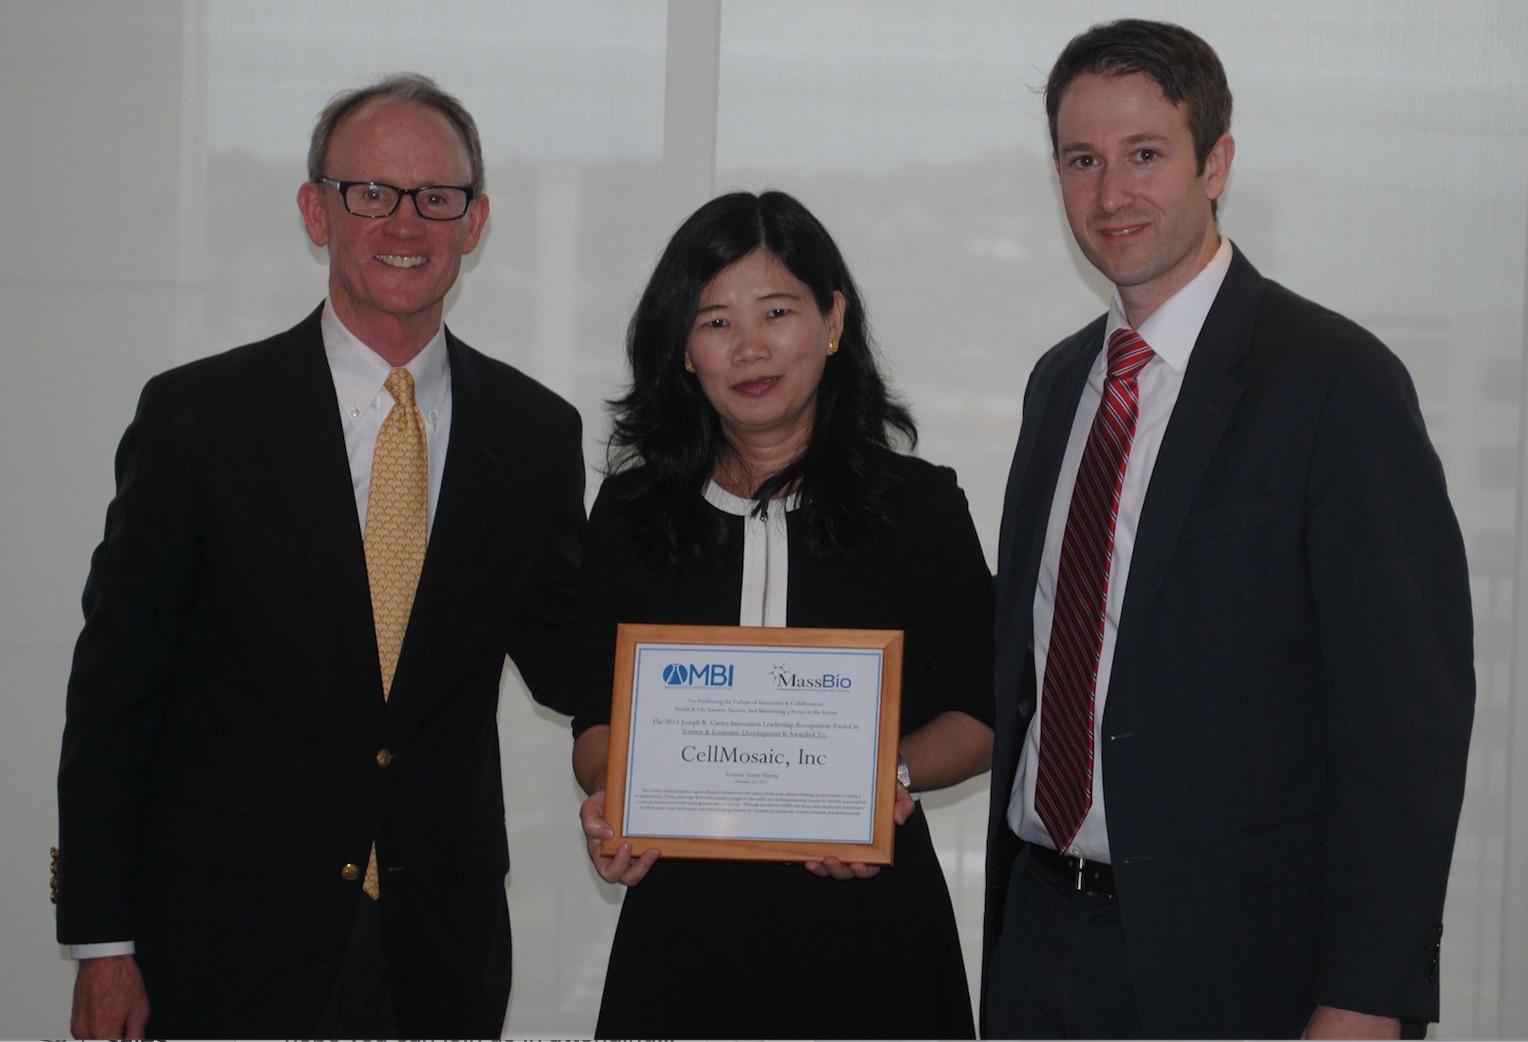 dsc-0501-award-2.jpg